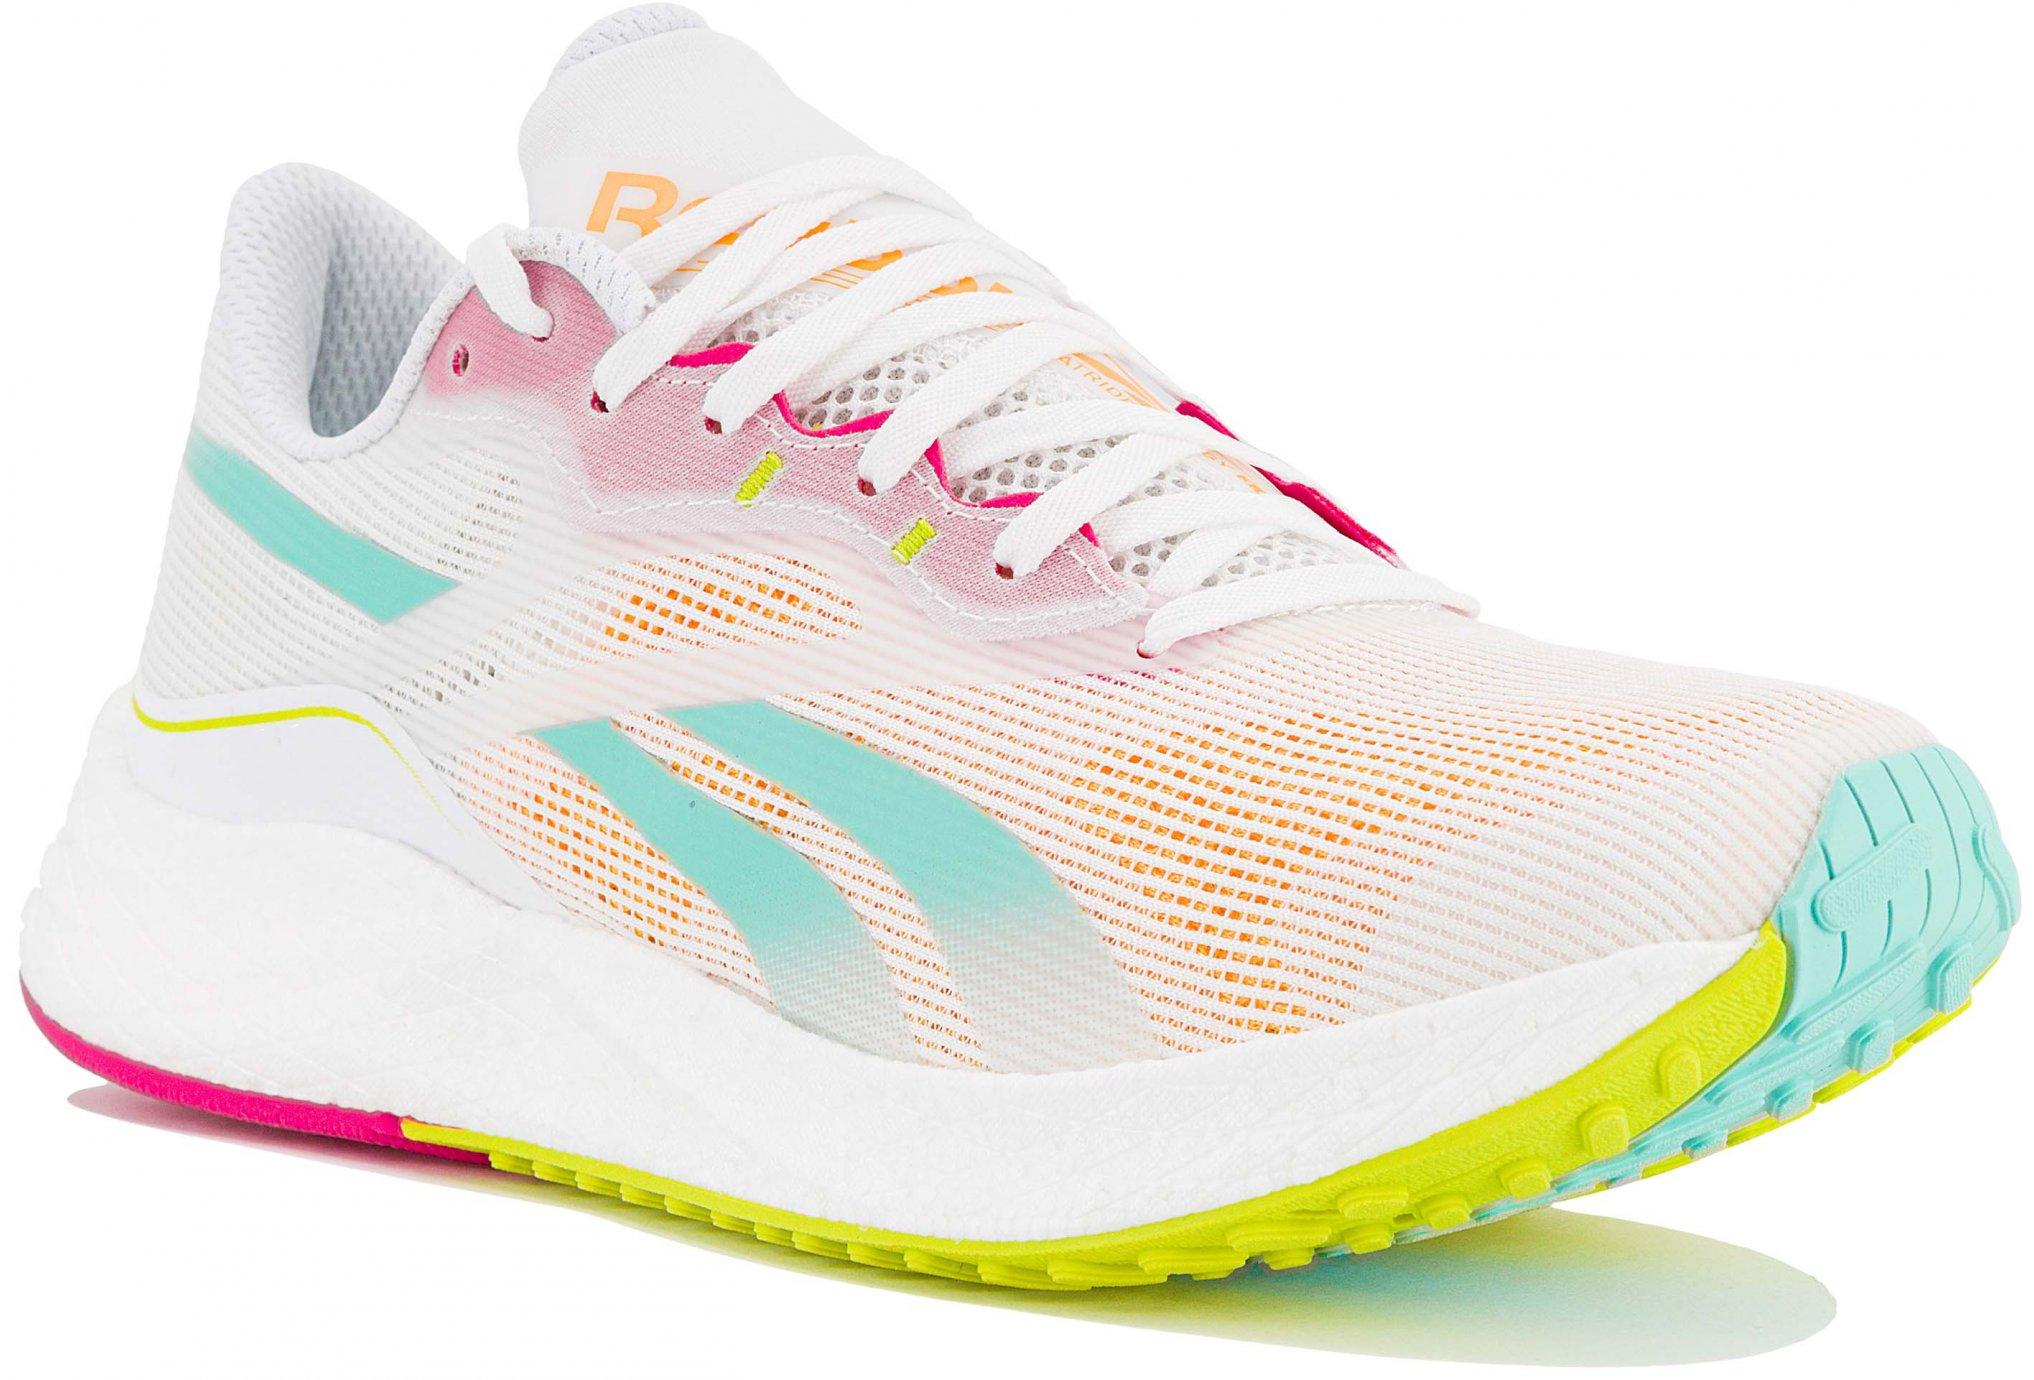 Reebok Floatride Energy 3.0 W Chaussures running femme